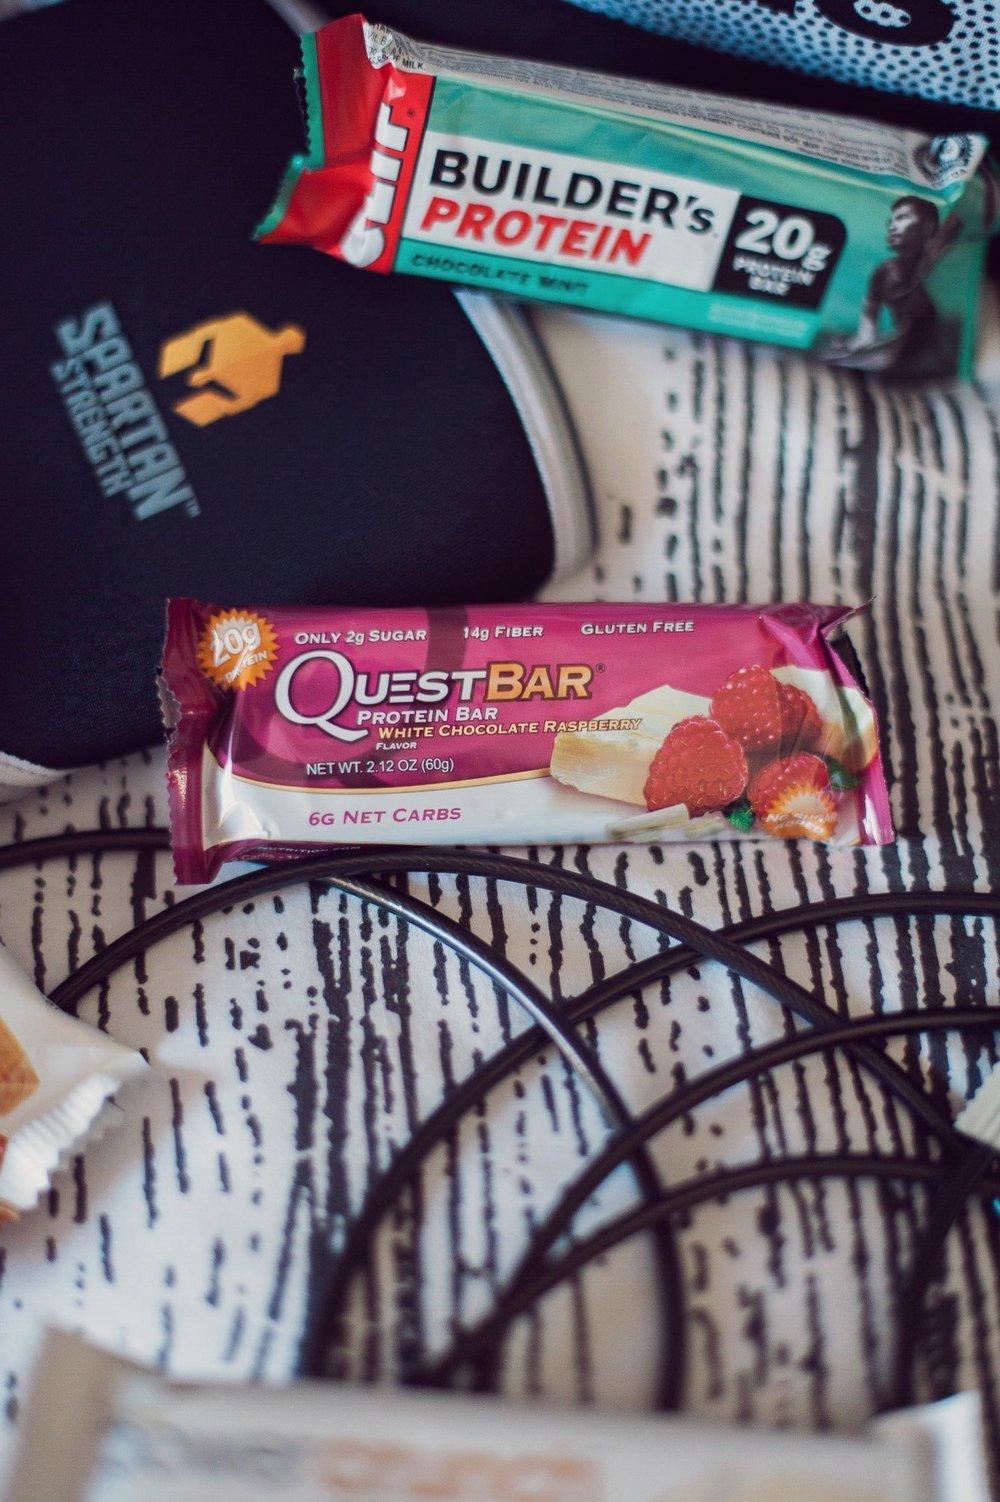 Top Five Protein Bars, top five protein bars, Quest Bar, ThinkThin, Power Crunch, Clif Builders, Protein Bars, protein bars,